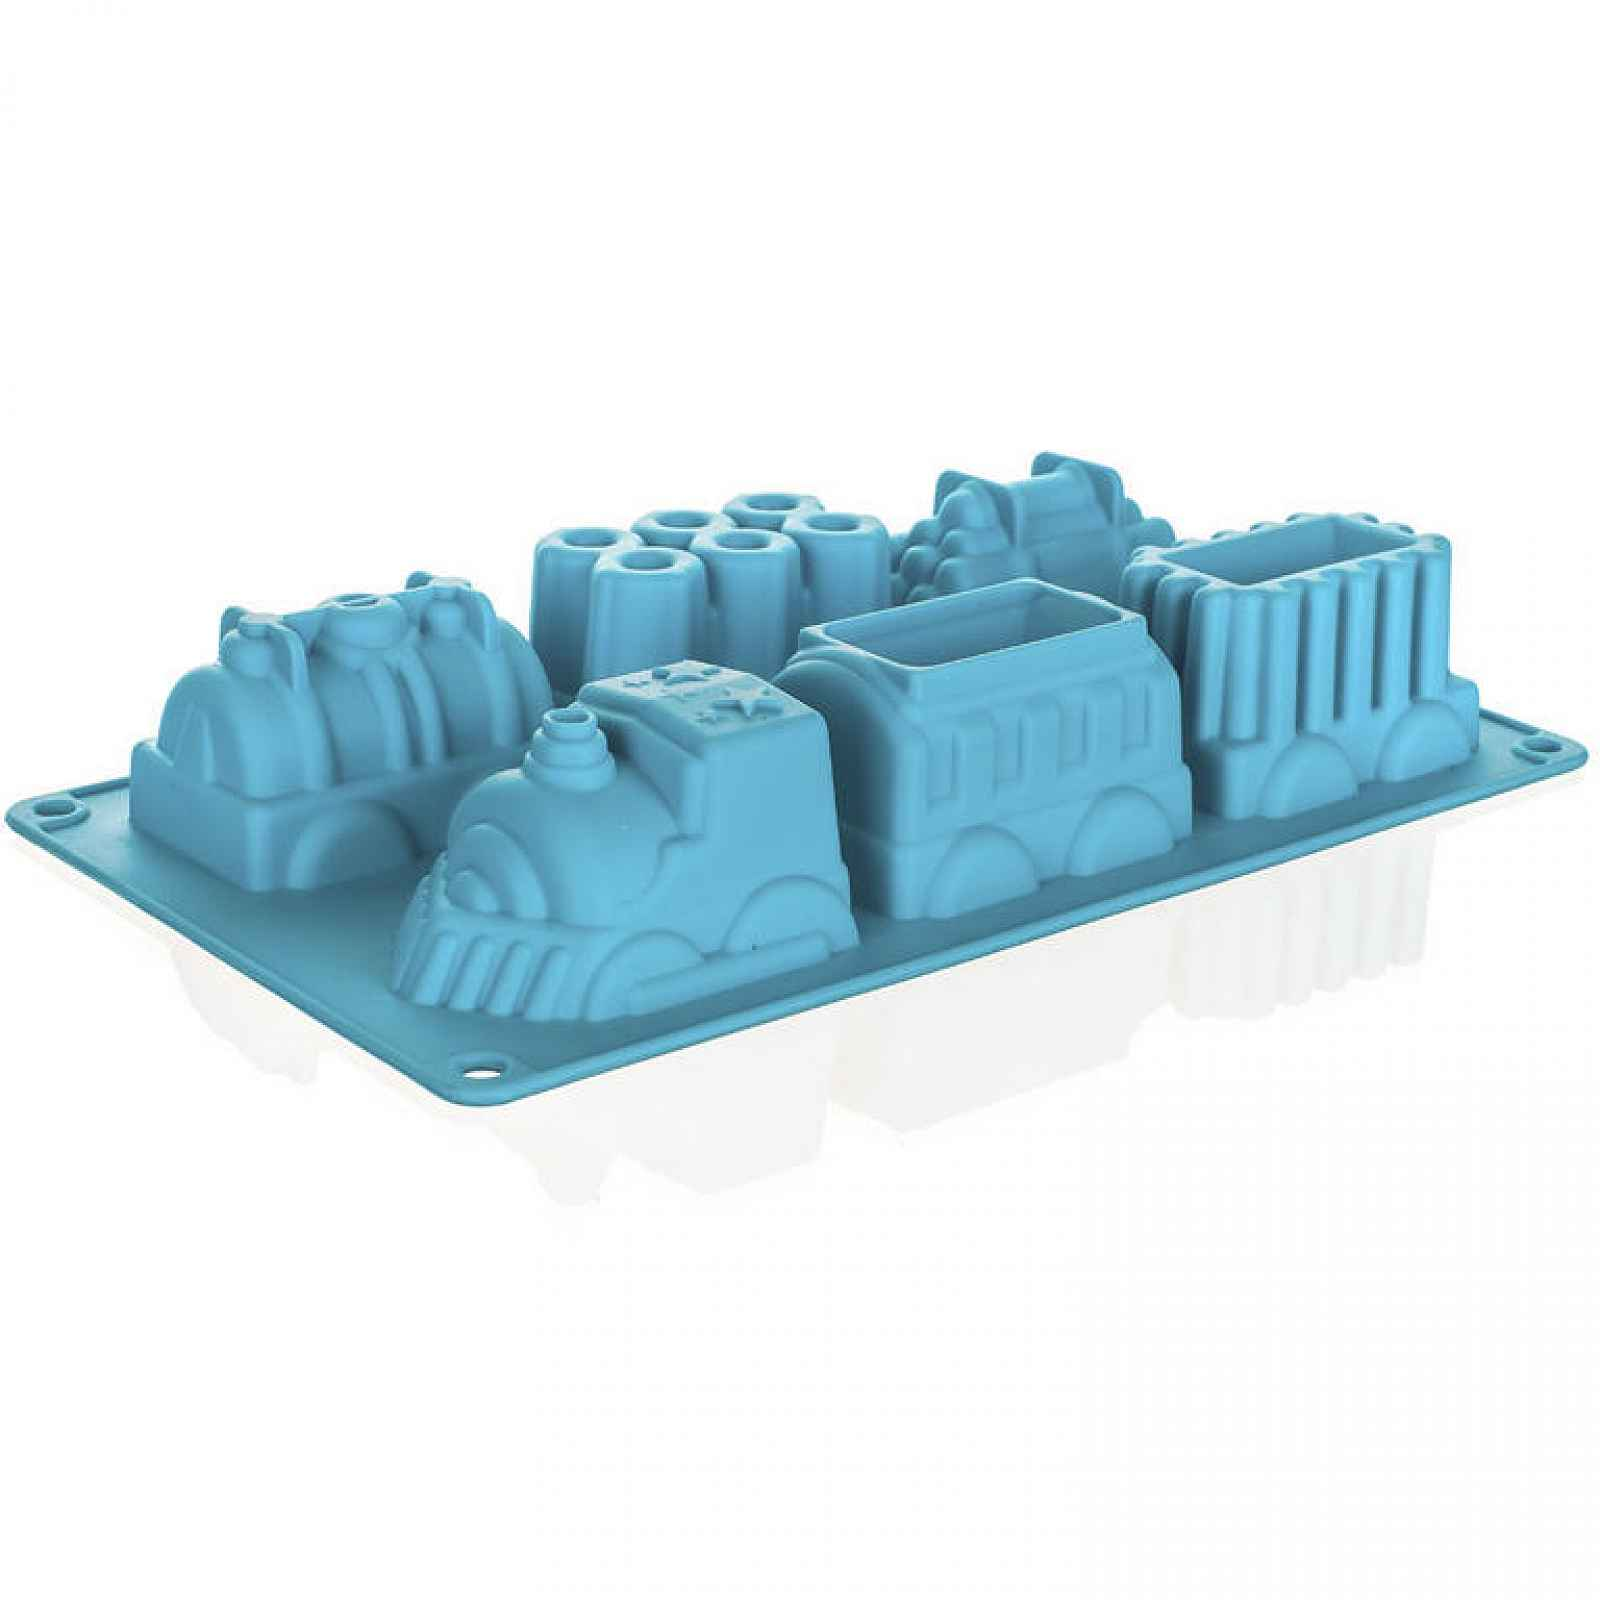 BANQUET Silikonová forma vlaky 29,5x17,3x4,3cm, váha 165g Culinaria